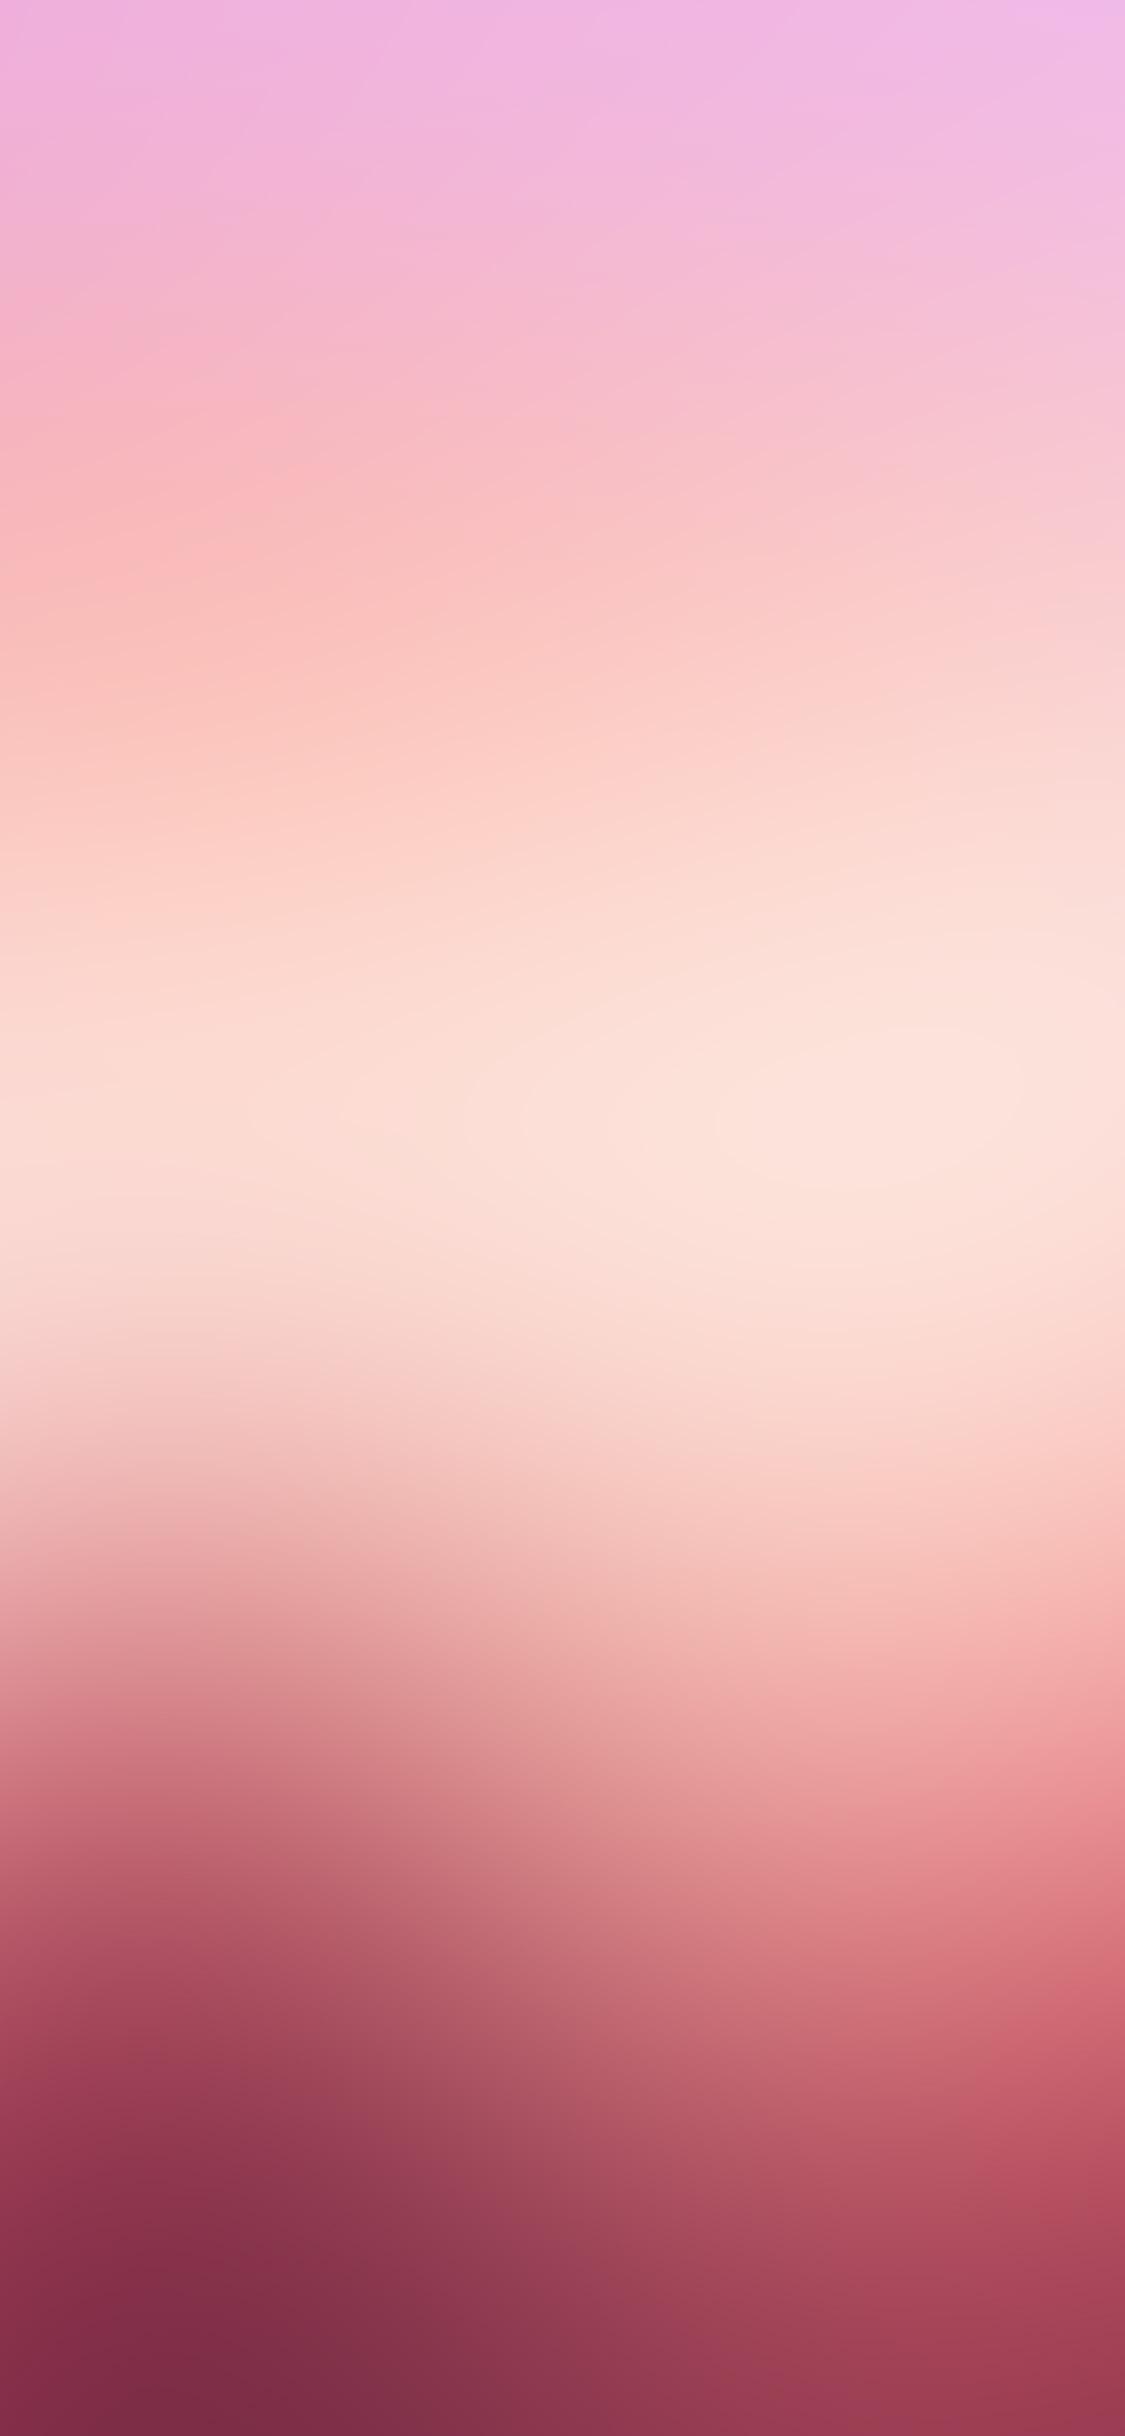 iPhonexpapers.com-Apple-iPhone-wallpaper-so20-happy-glare-blur-gradation